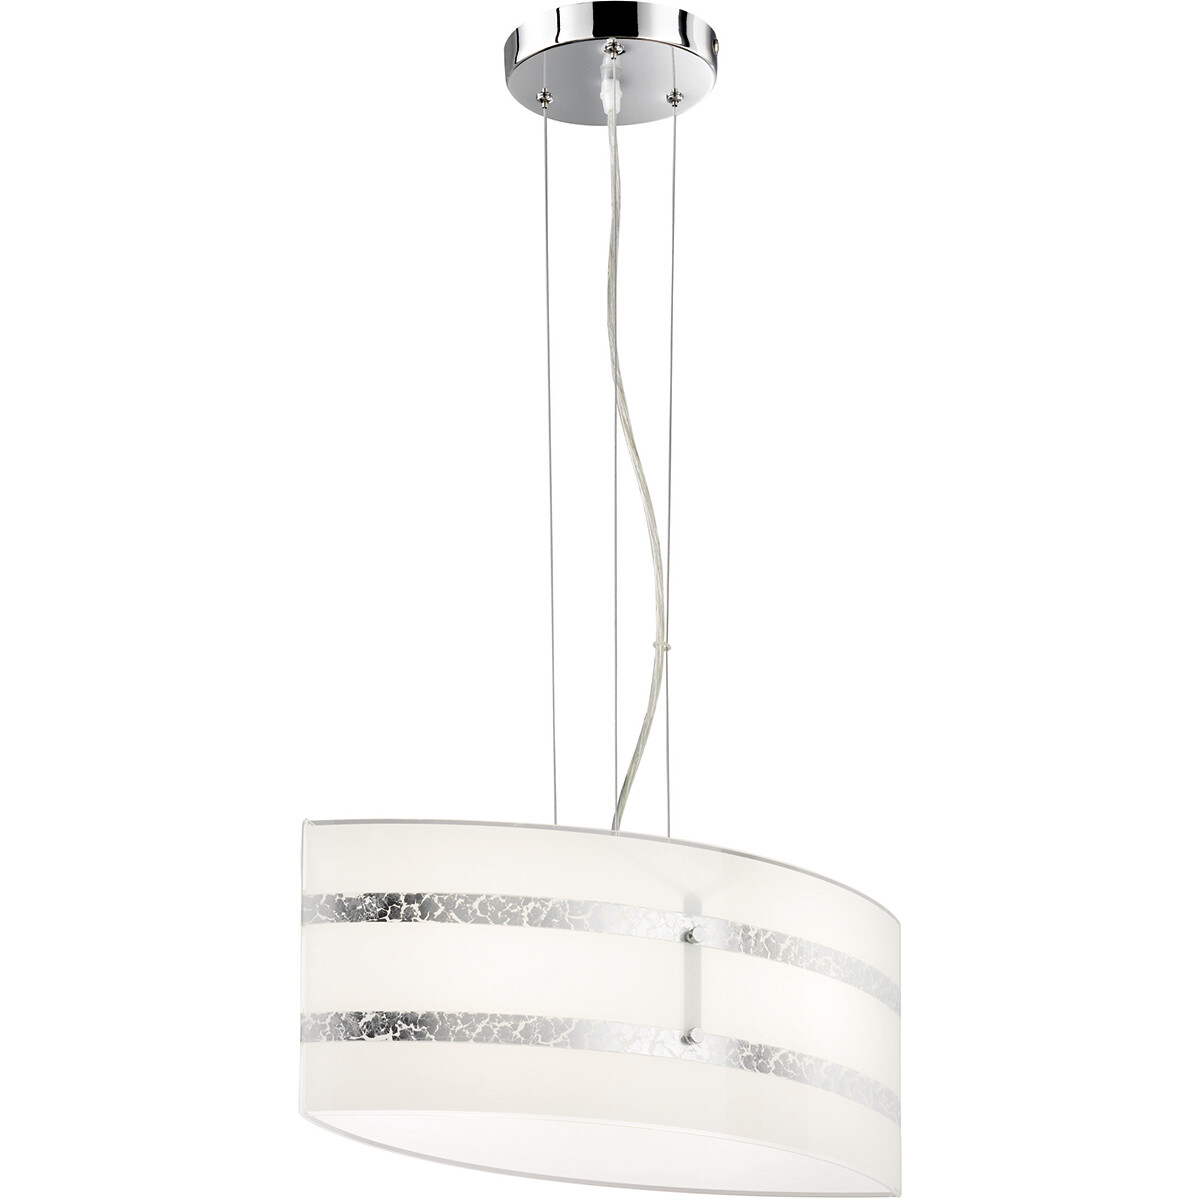 LED Hanglamp - Hangverlichting - Trion Niki - E27 Fitting - 1-lichts - Rechthoek - Mat Zilver - Alum